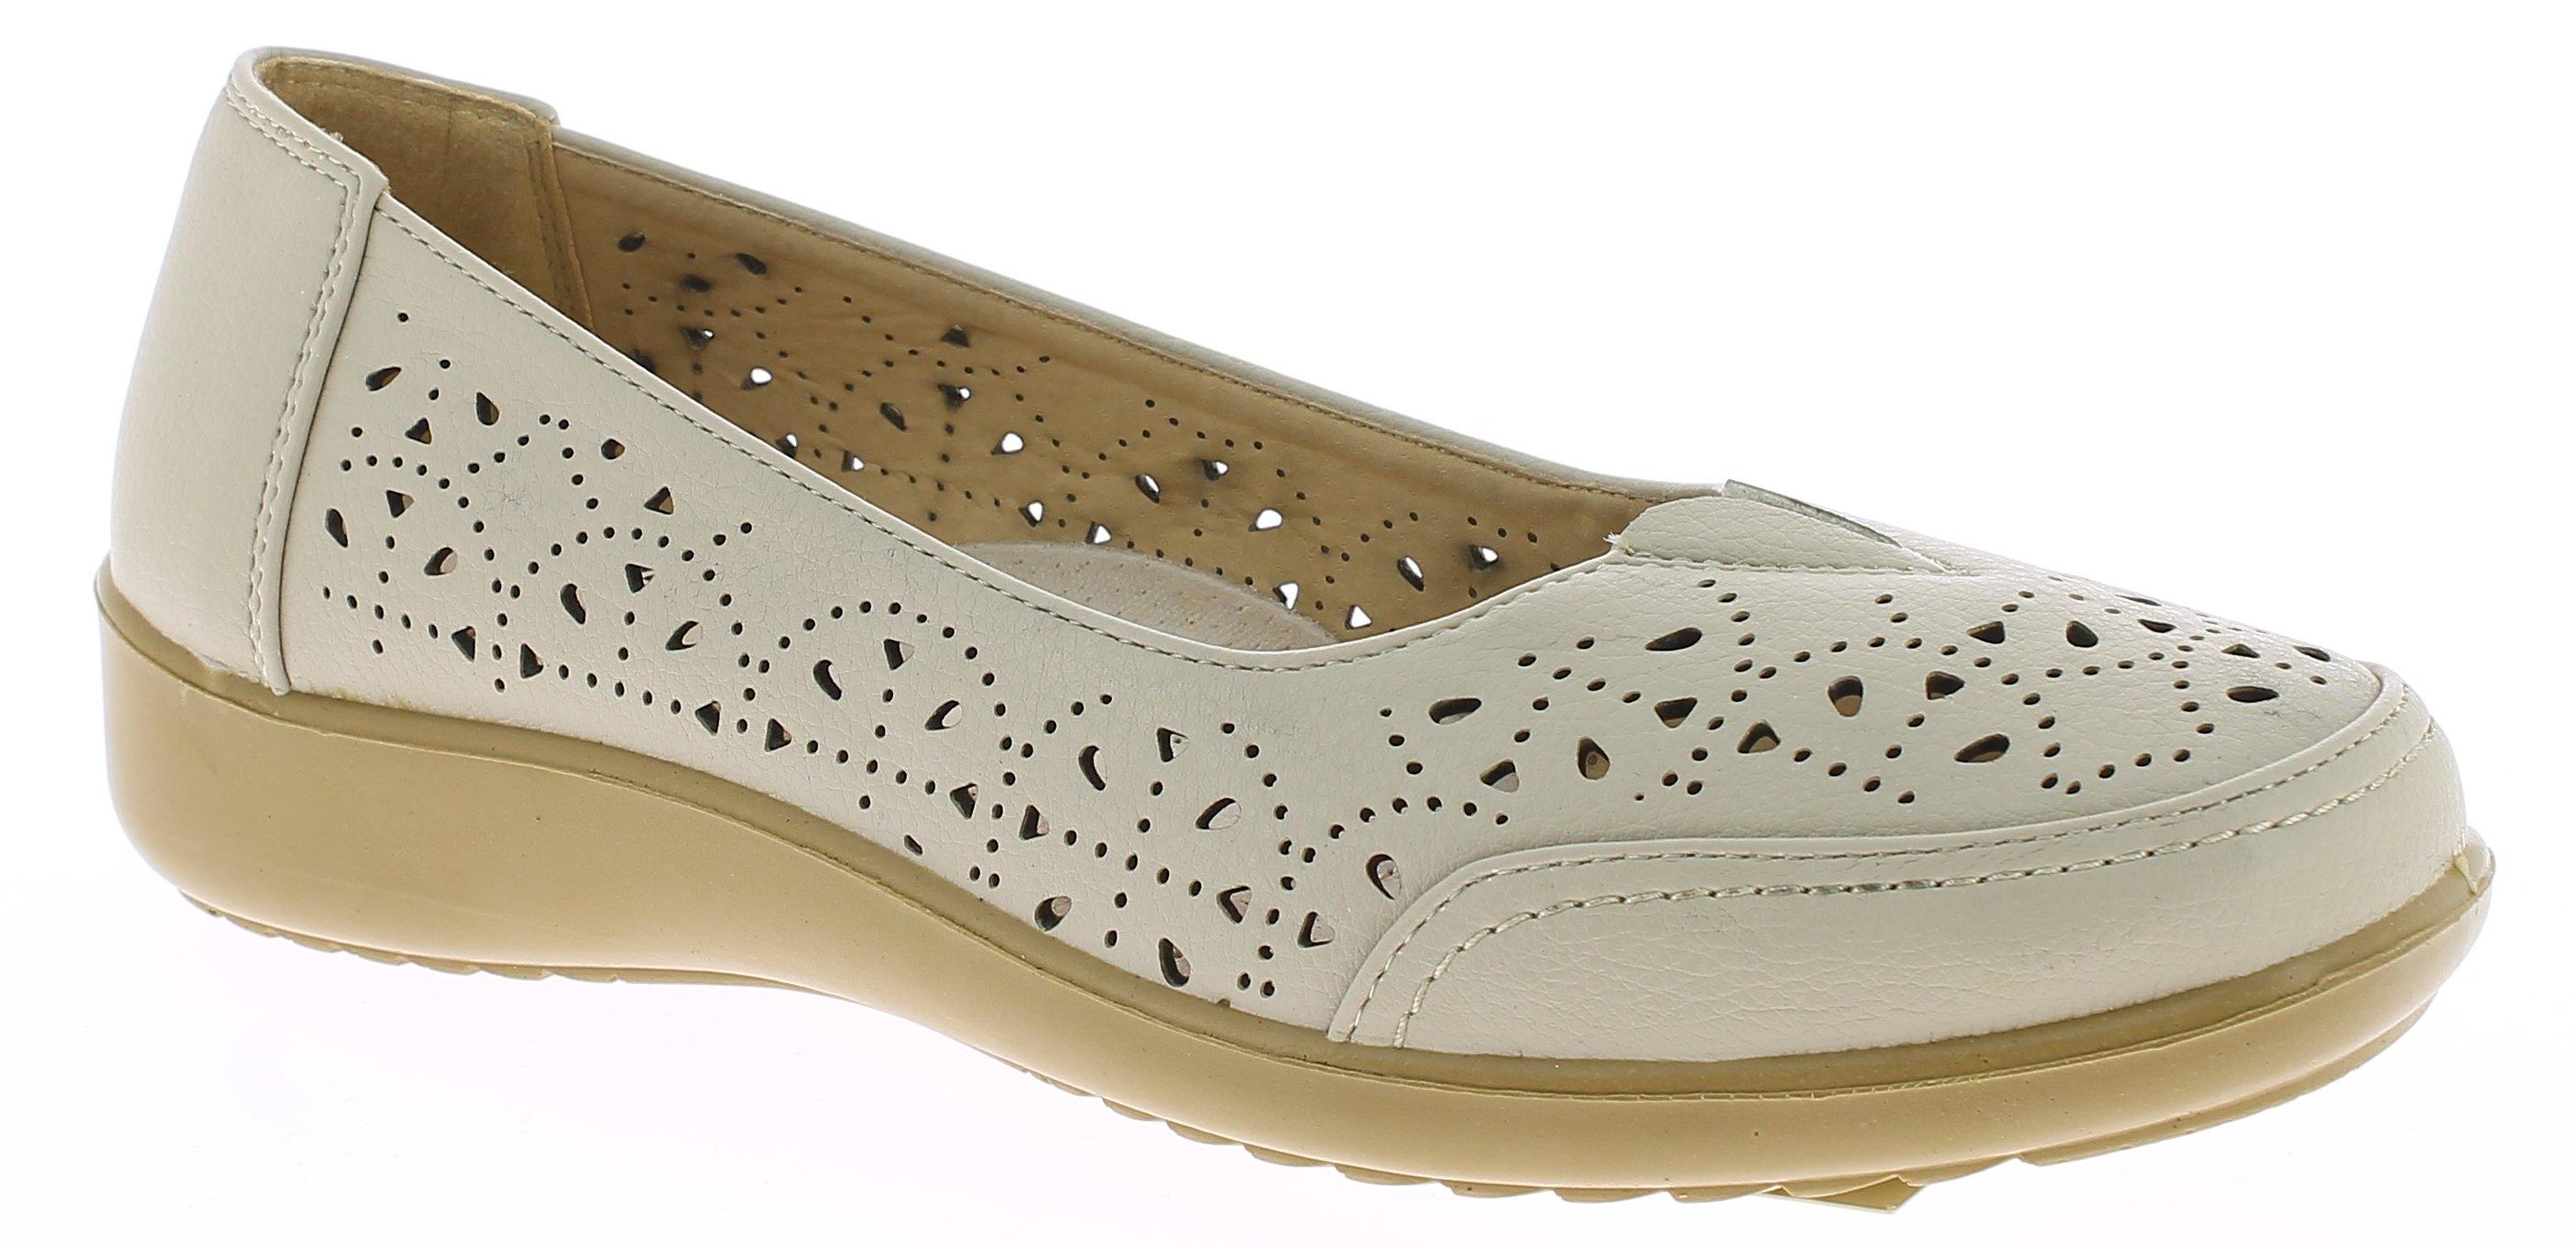 ANTRIN Γυναικείο Comfort NICOLE-105 Μπέζ - IqShoes - NICOLE-105 BEIGE-beige-36/1 προϊόντα παπούτσια